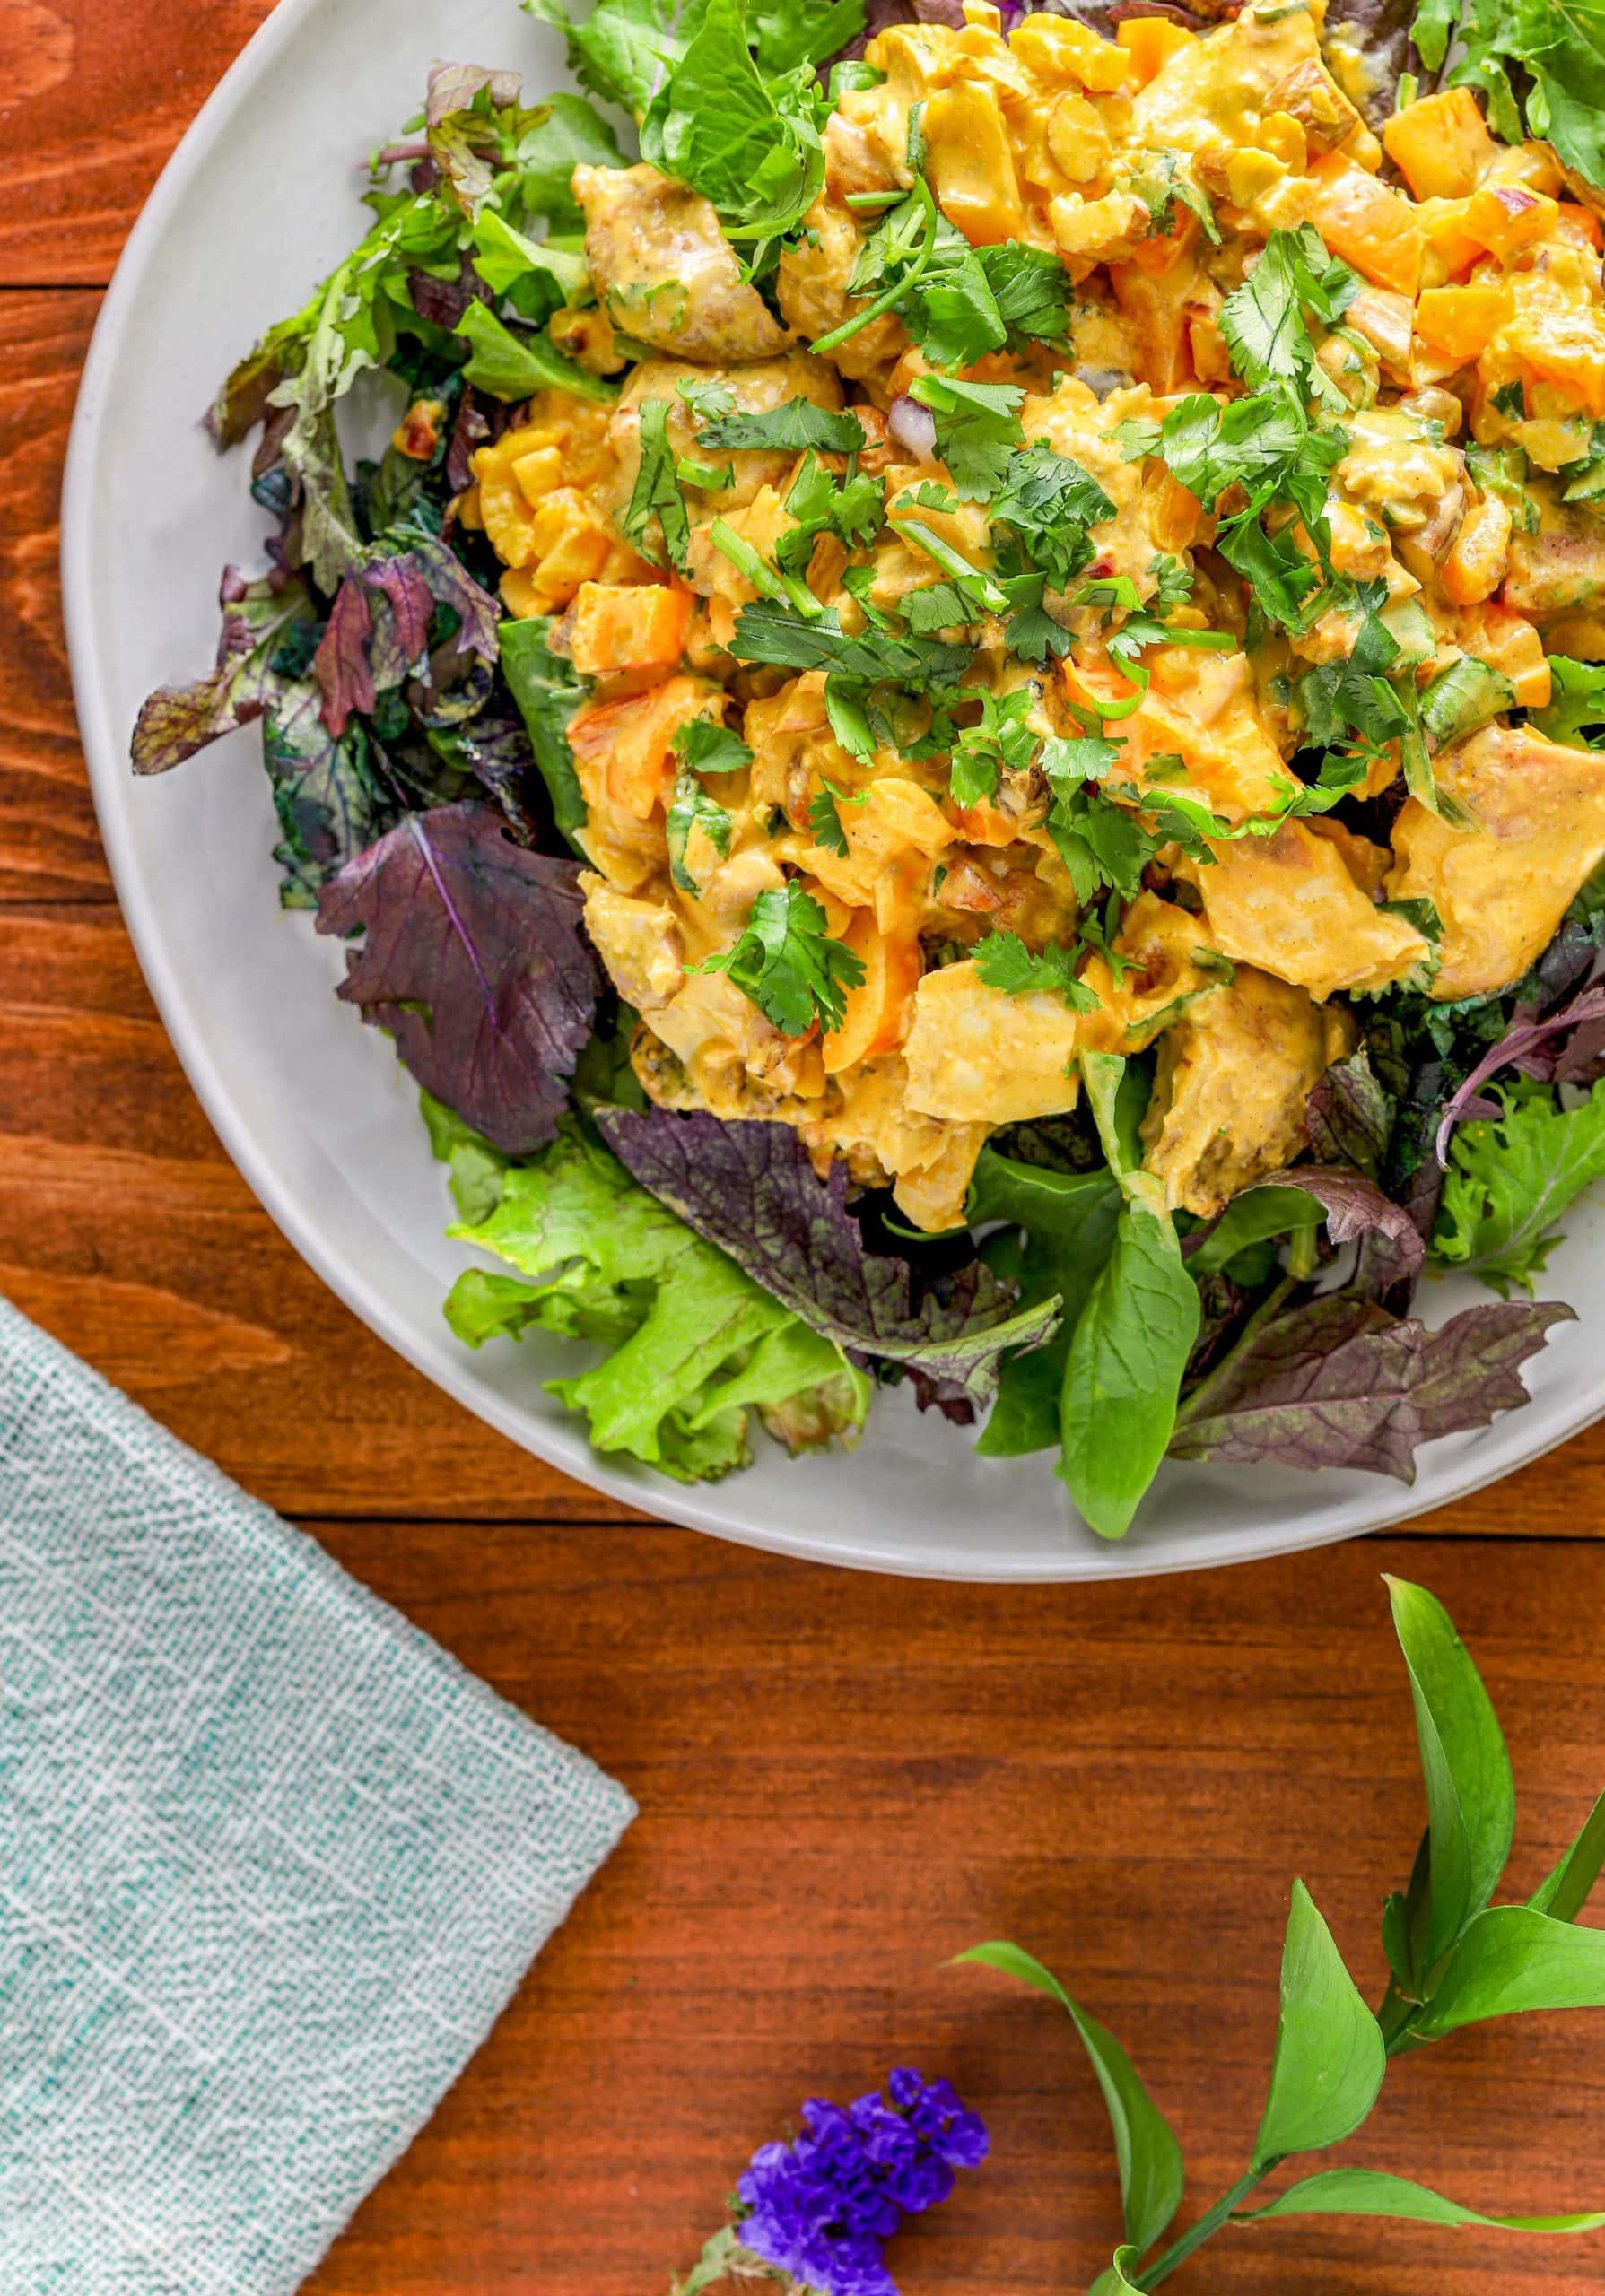 coronation chicken salad on plate